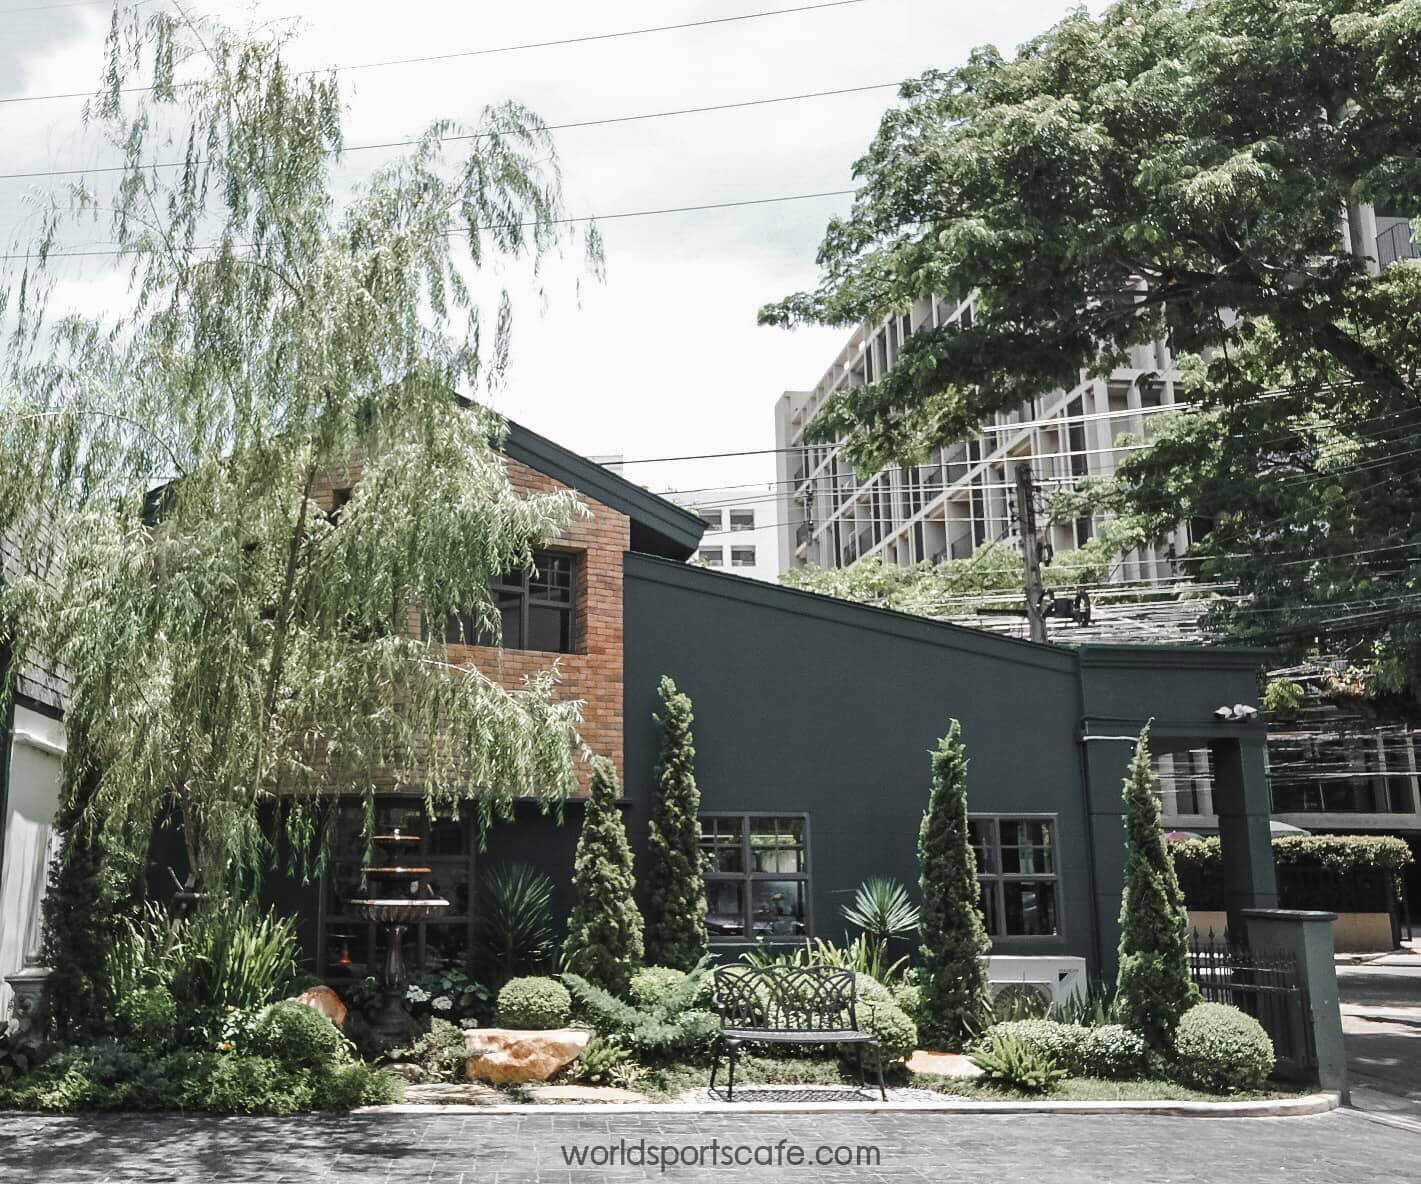 """LAFF Cafe"" สไตล์โฮมเมด ต้นไม้นานาชนิด"